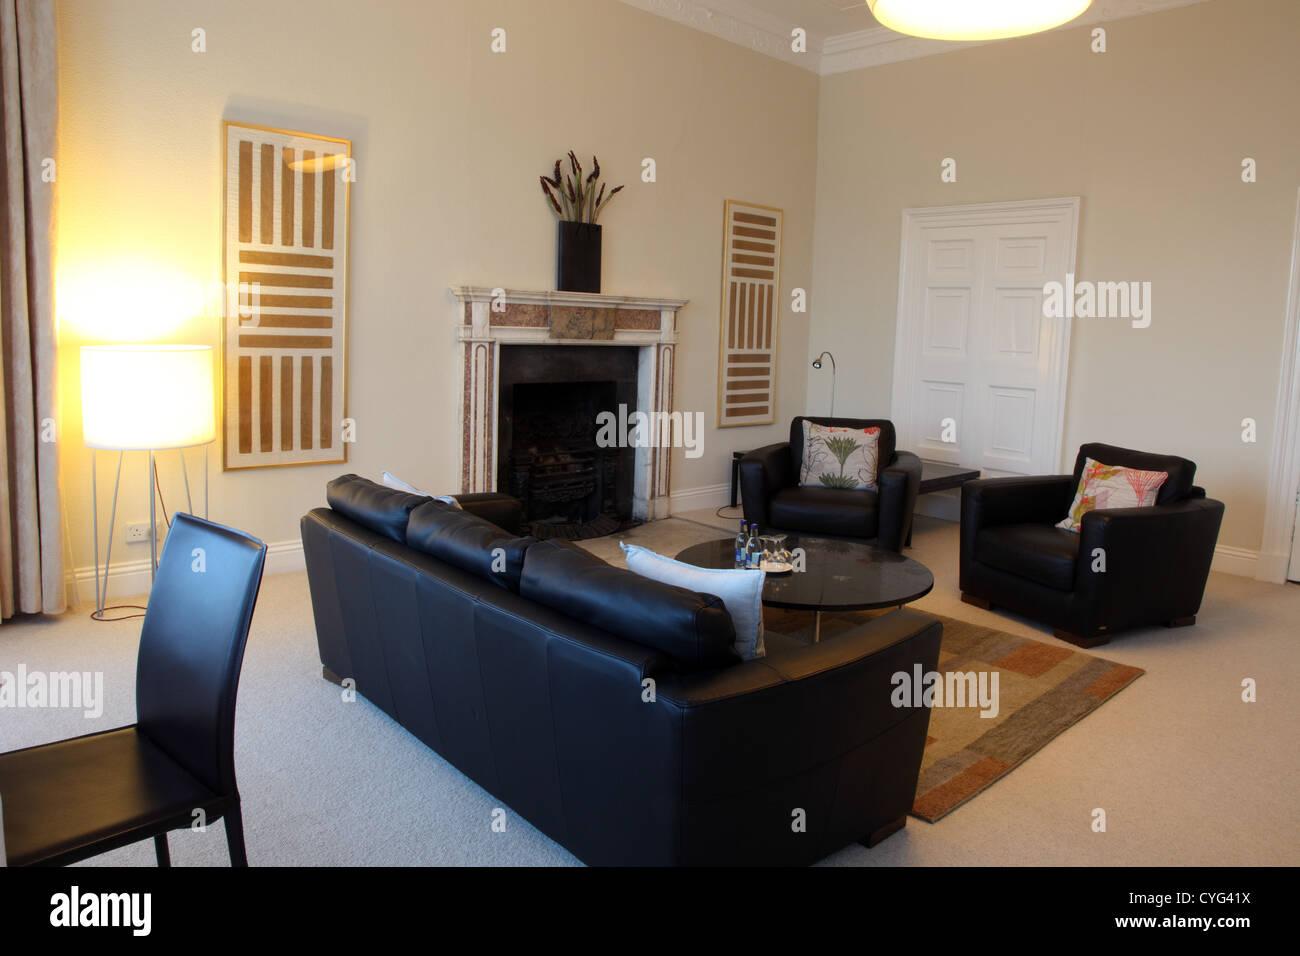 Presidential Suite sitting room, Butler House, Kilkenny - Stock Image